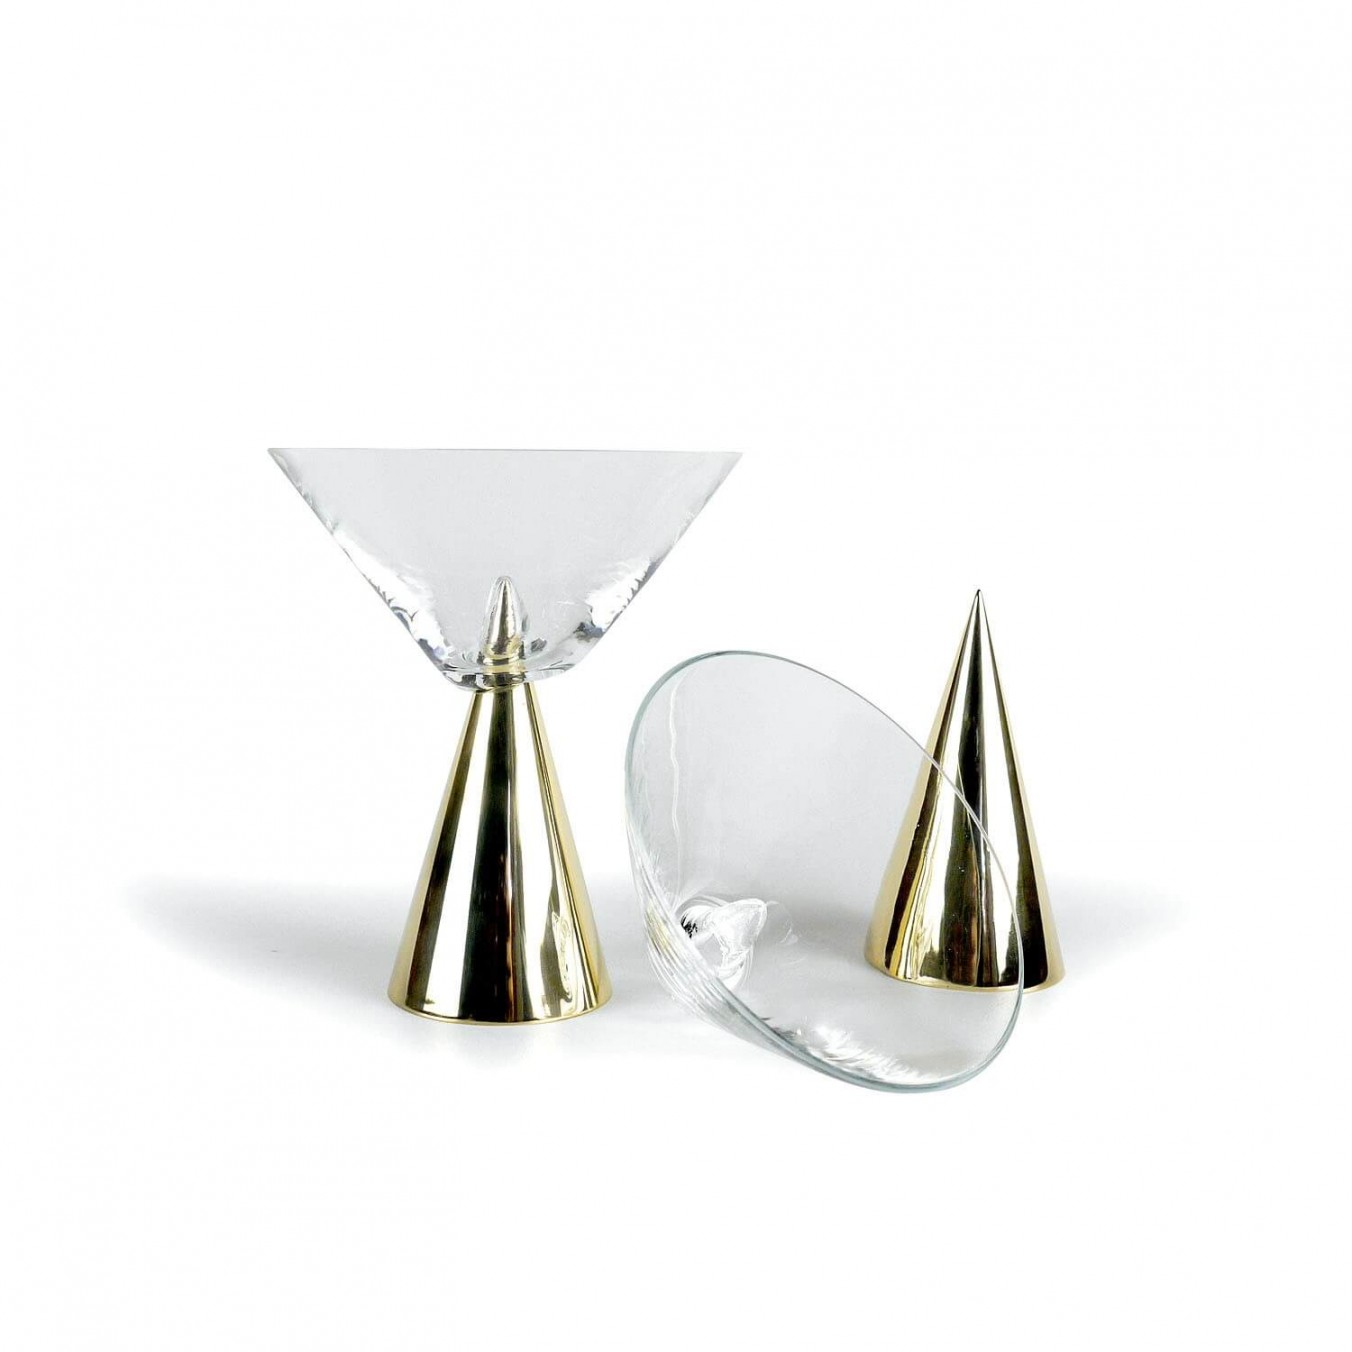 Cone Martini (set of 2)